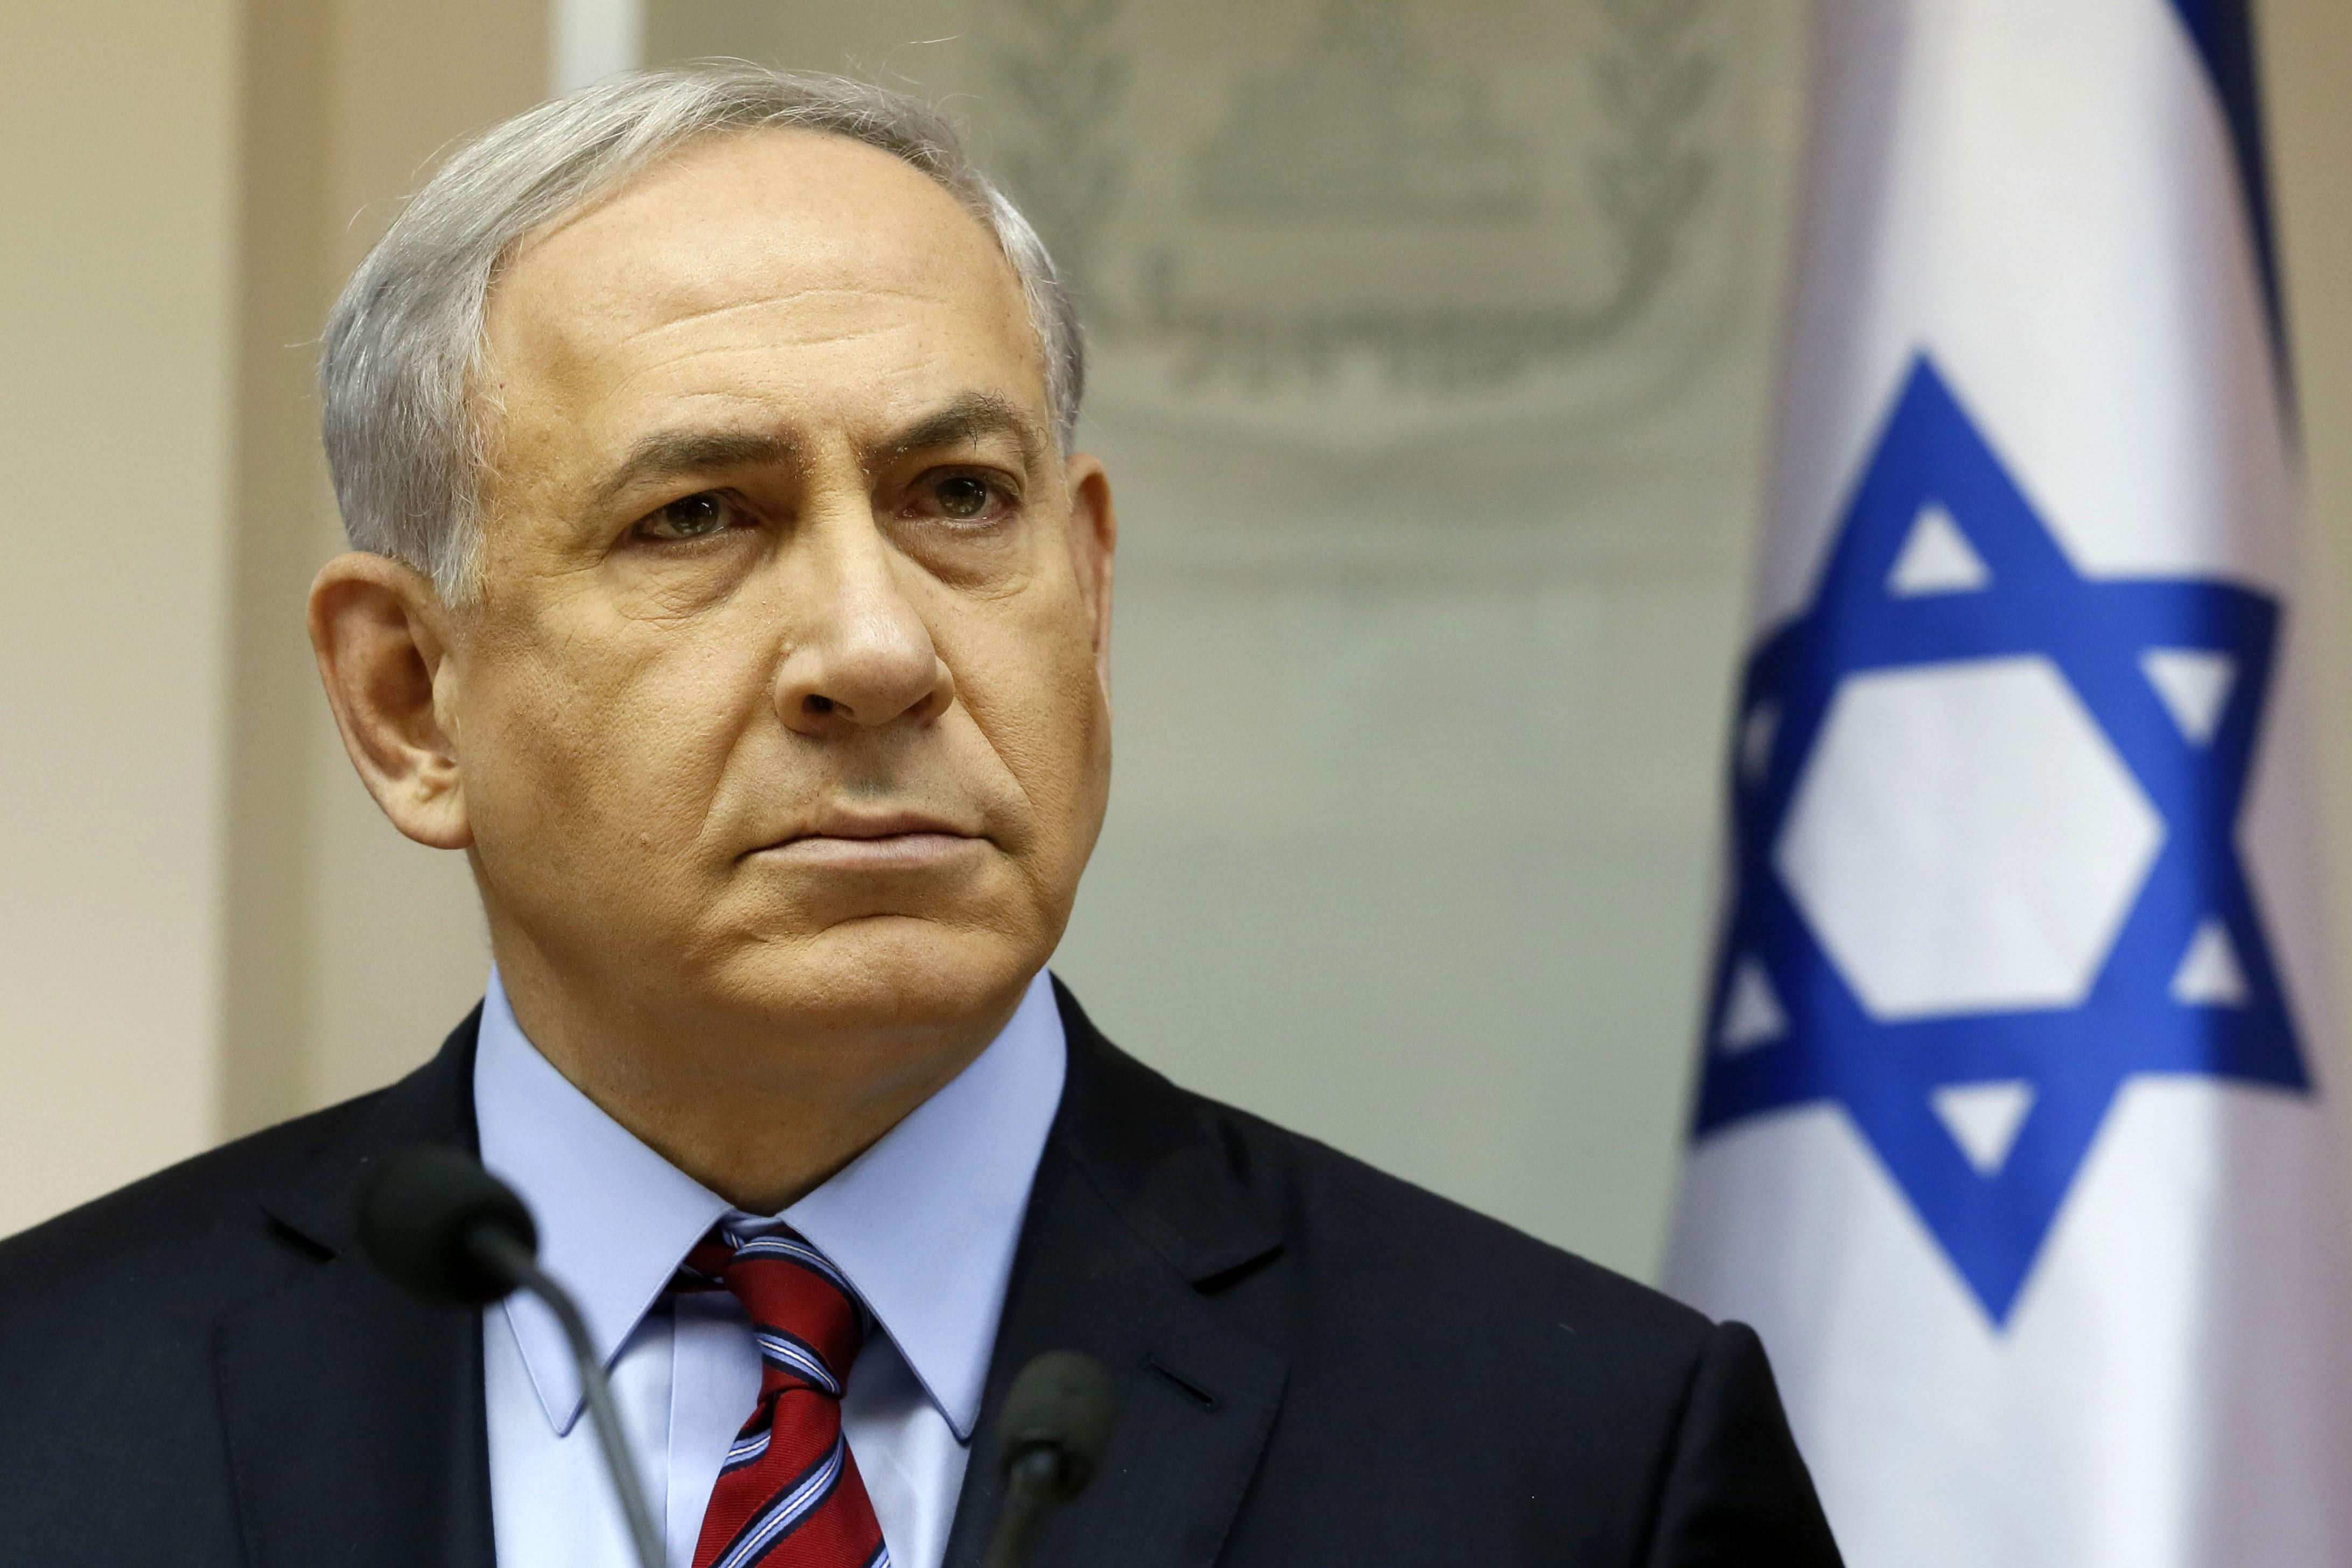 Prime Minister of Israel plans to visit Azerbaijan